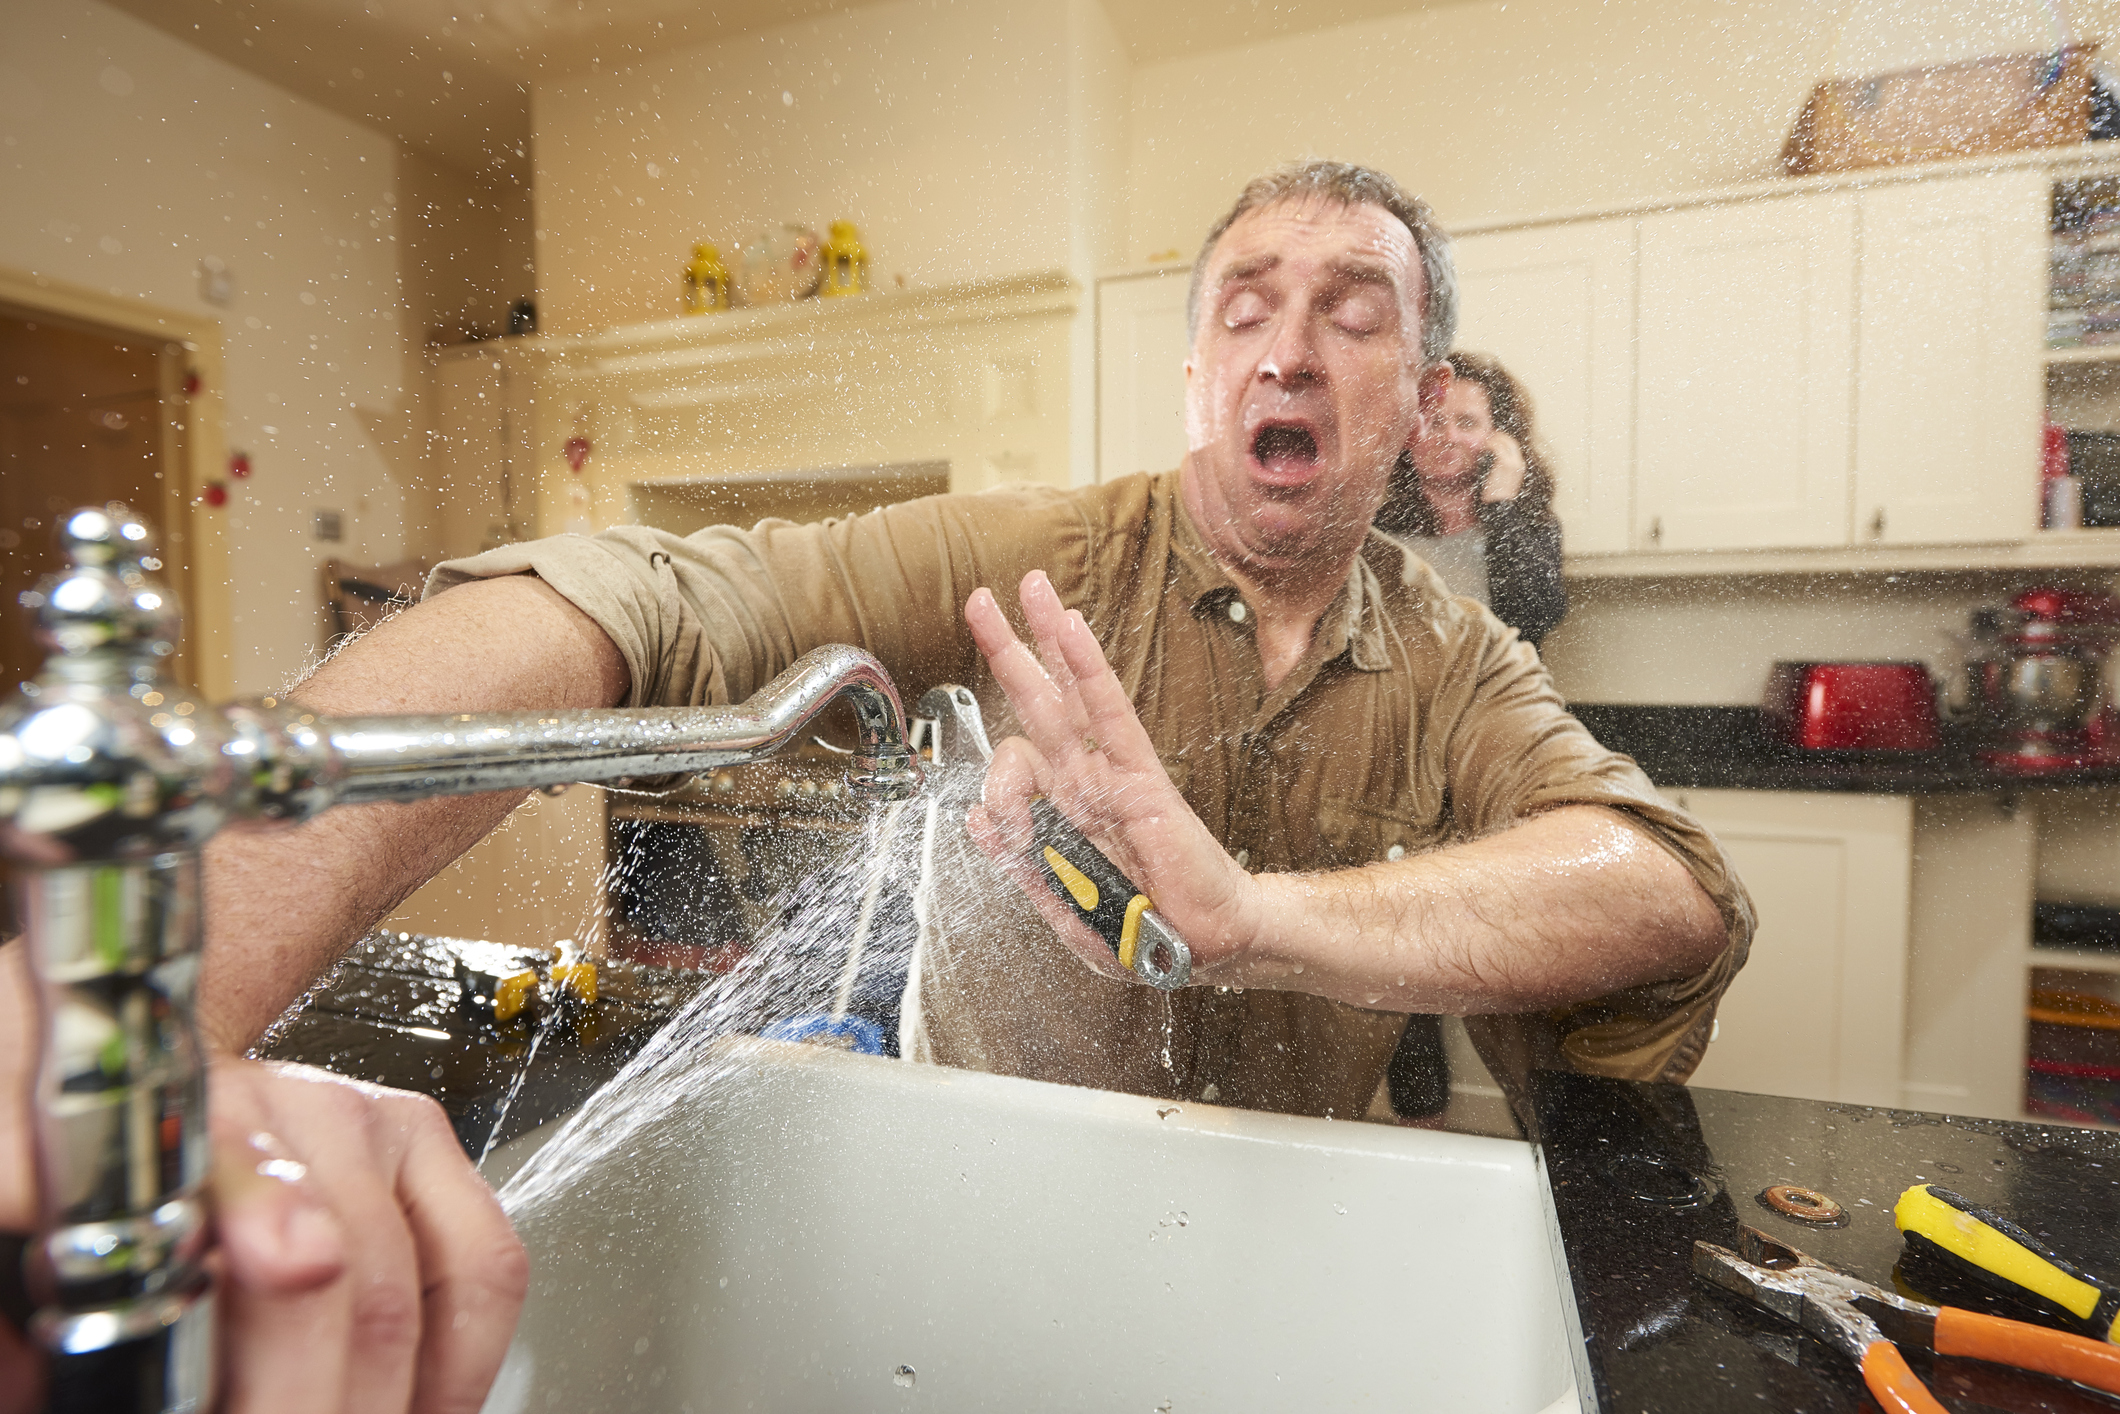 Comfort 101: Day & Nite Plumbing is Your Weekend Solution